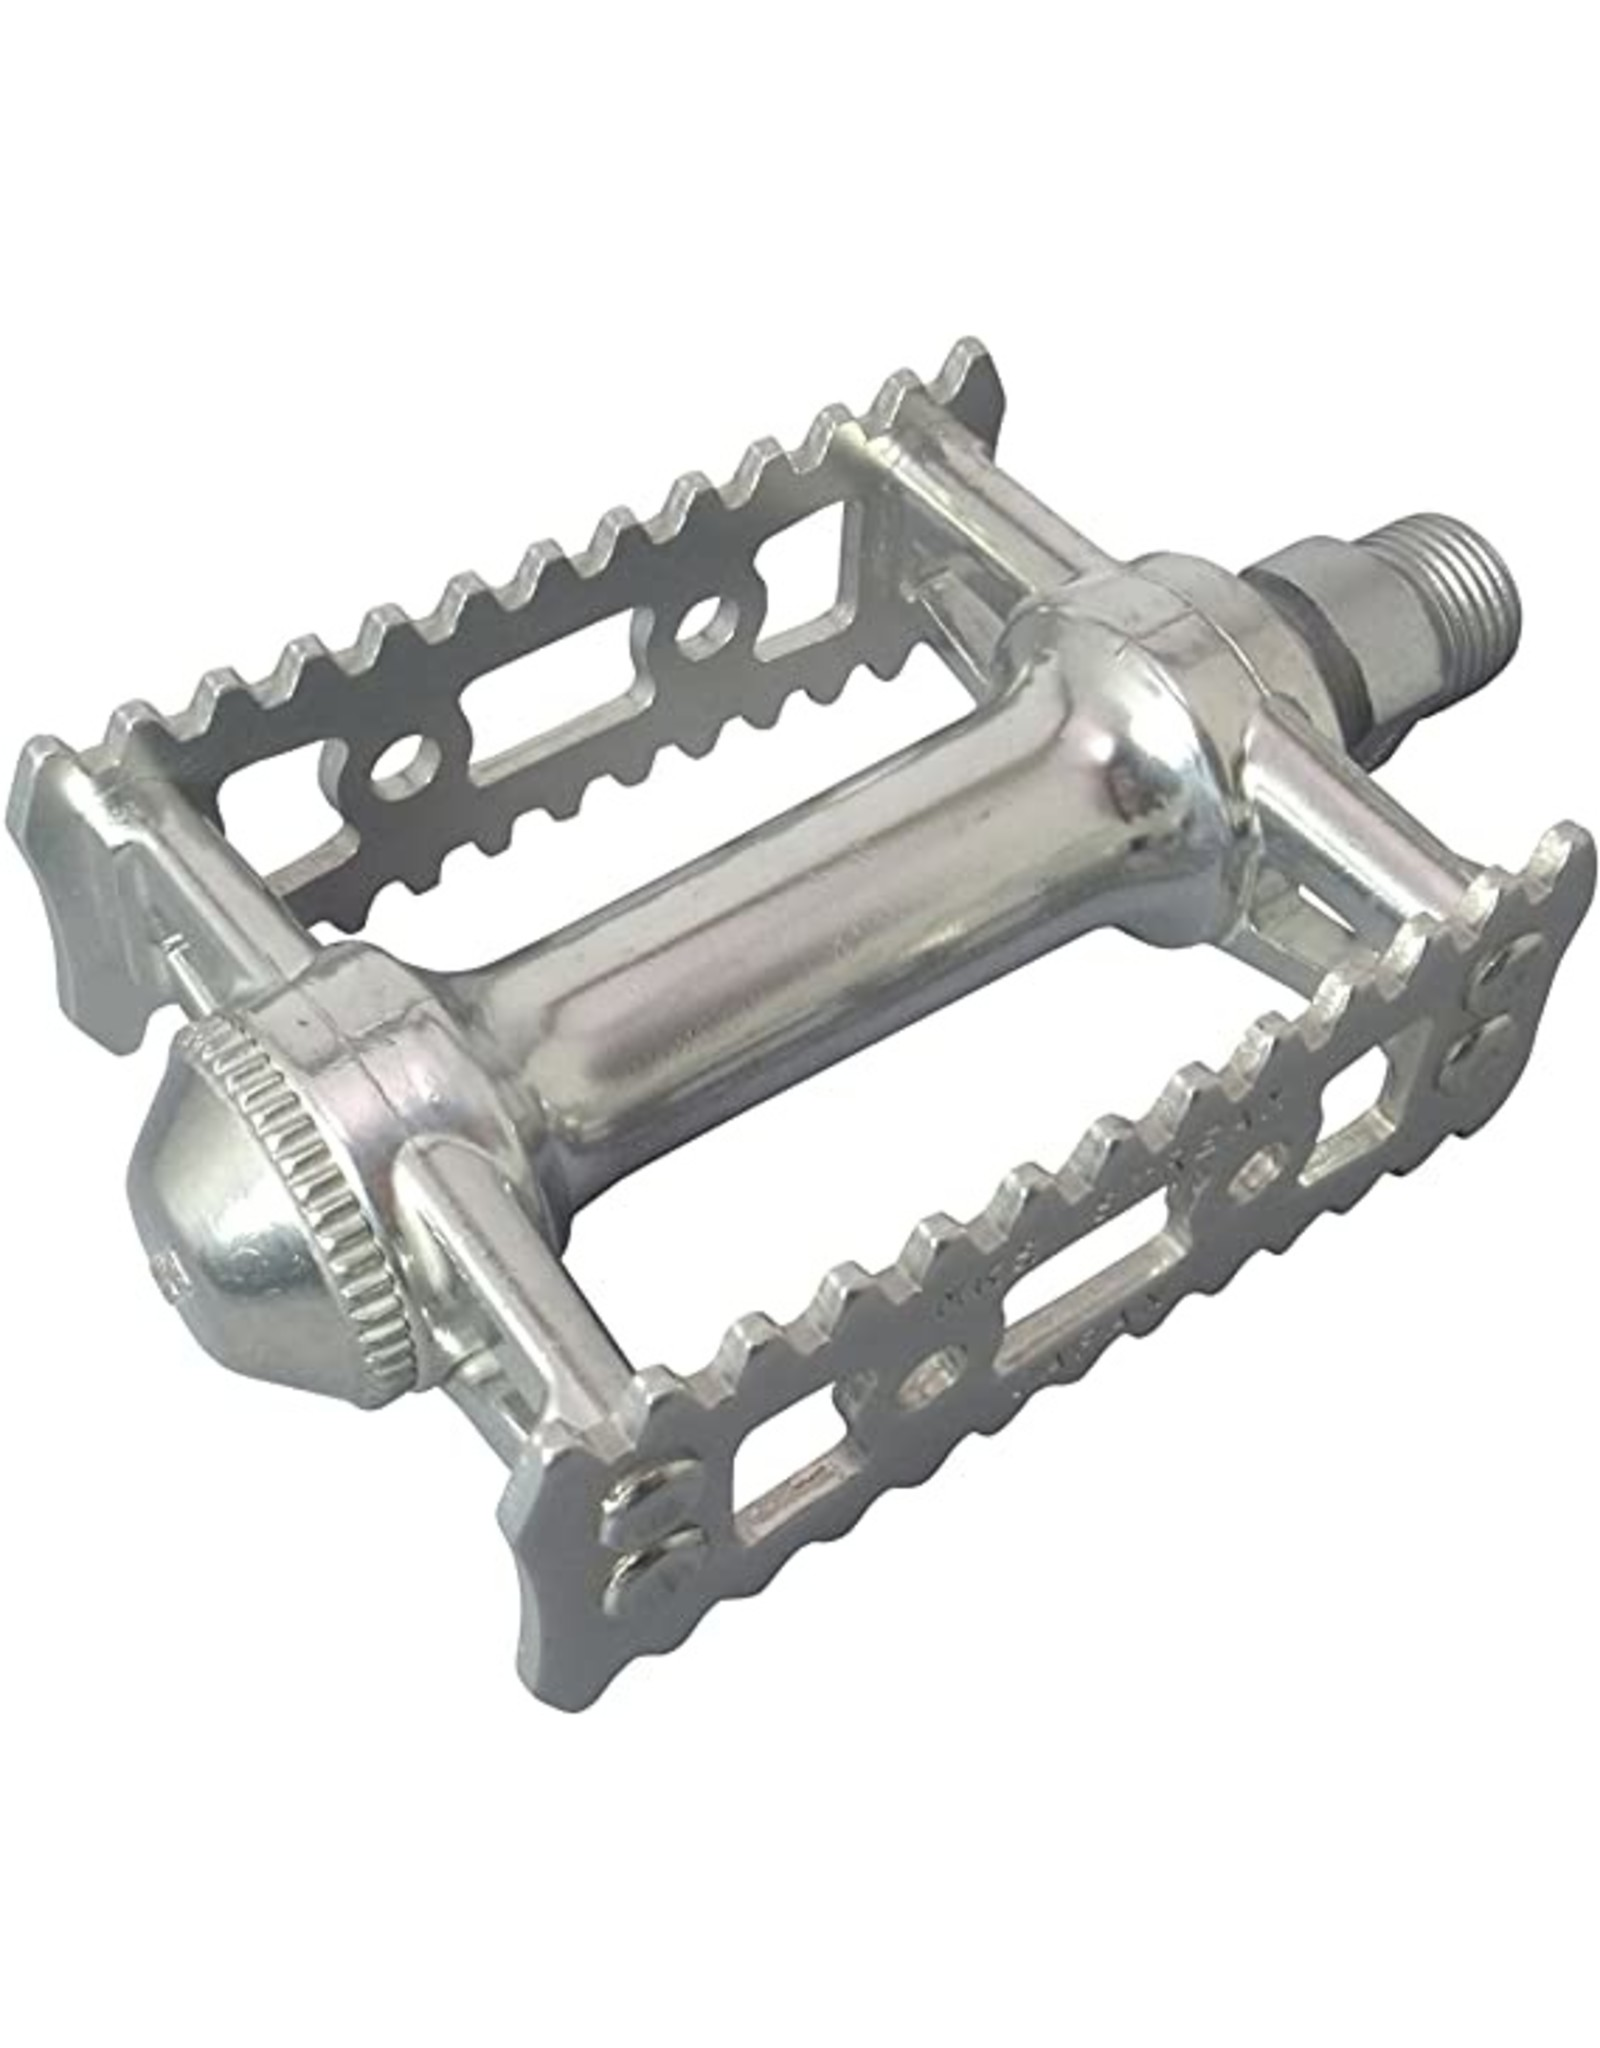 Mks MKS Pedals Sylvan Stream Short Cage (Silver)